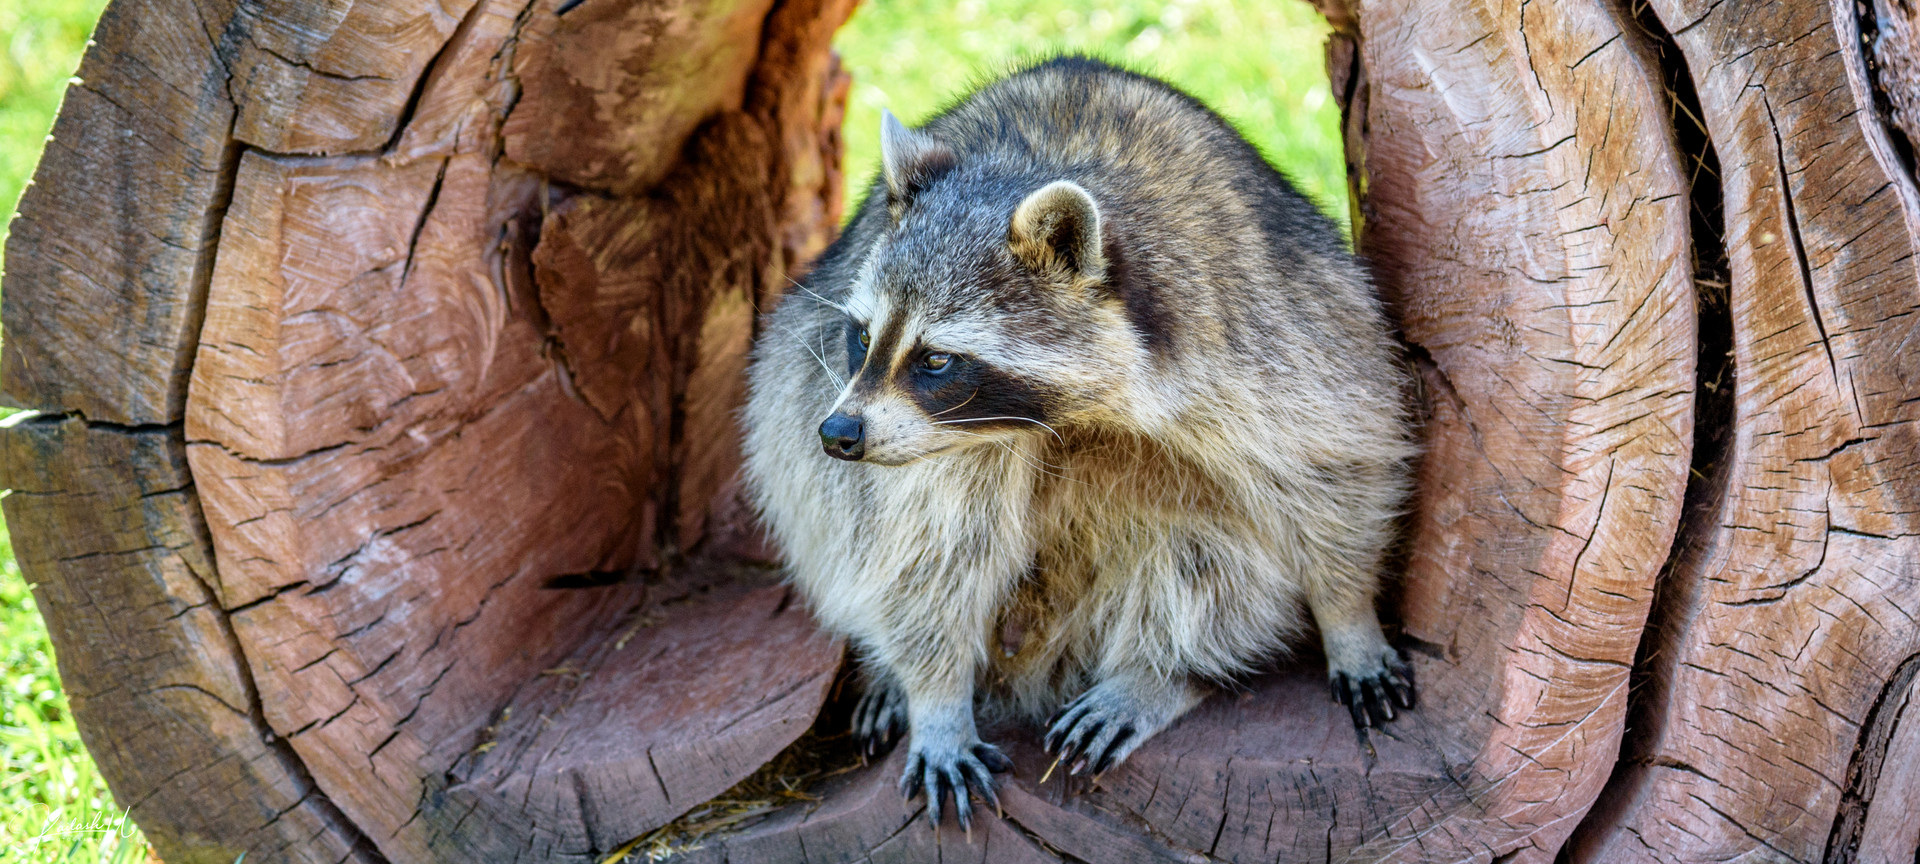 Racoon in South Dakota